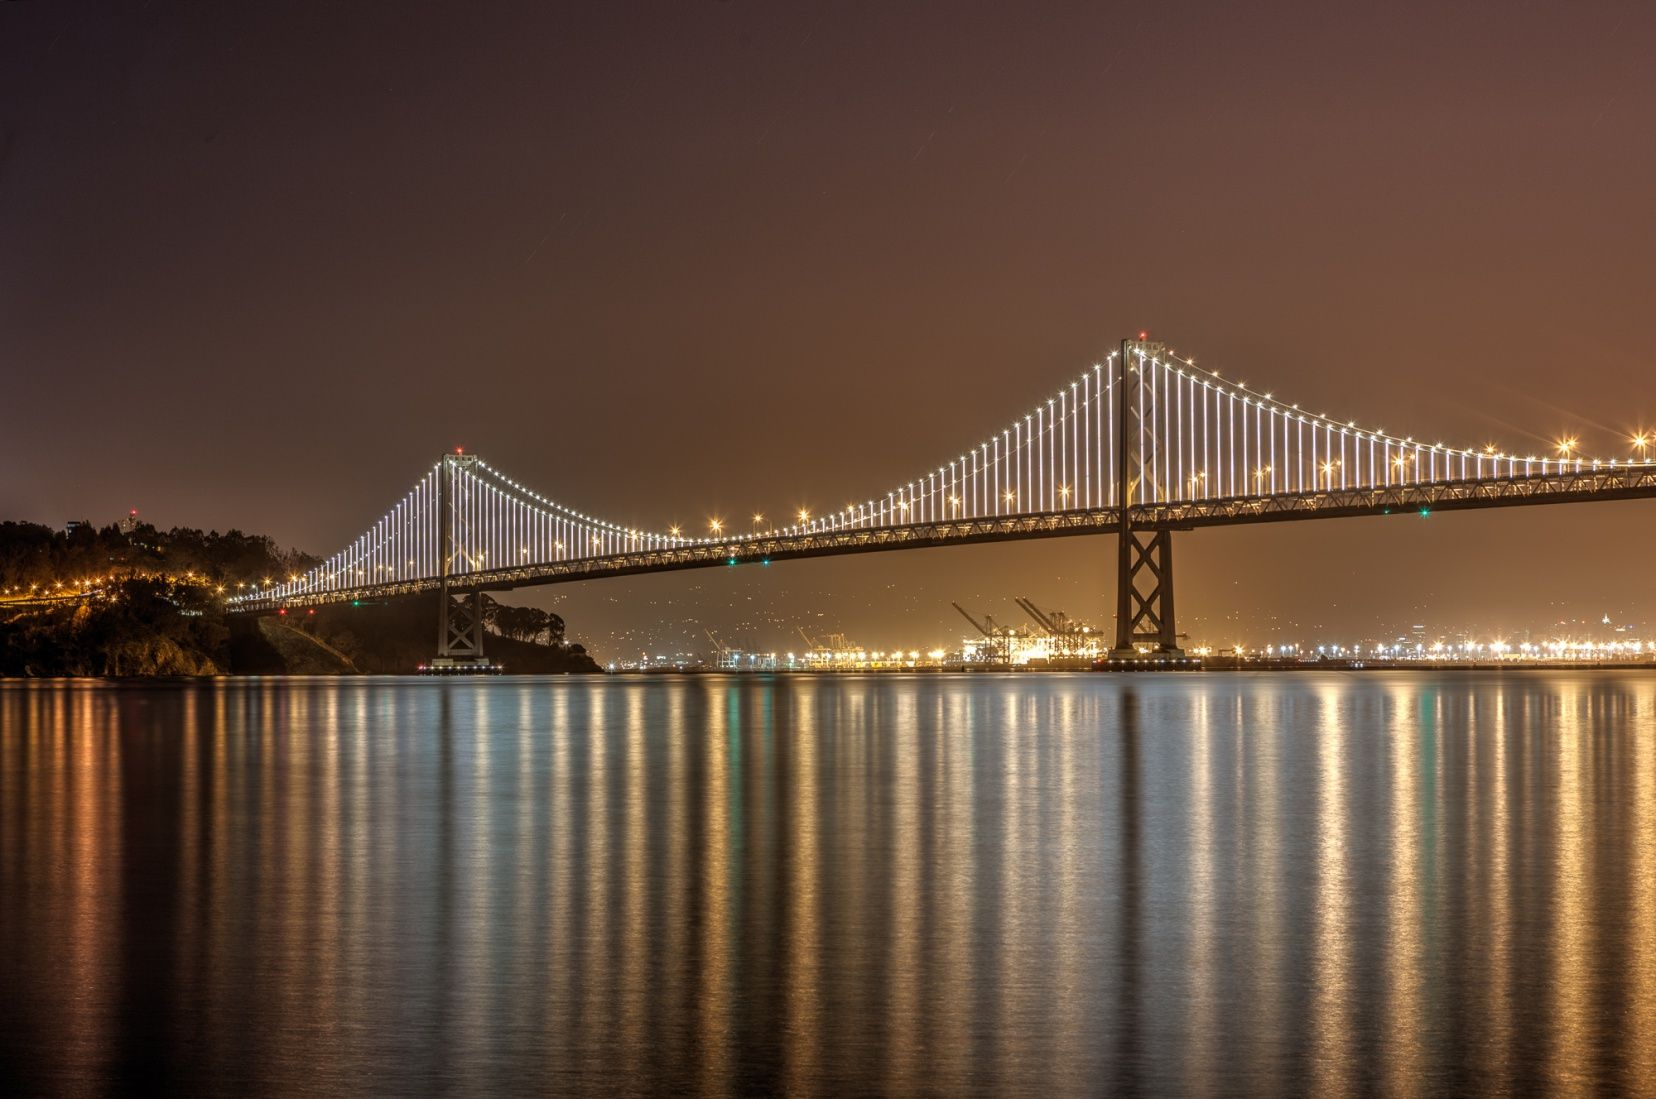 The Bay Lights Installation on the San Francisco Bay Bridge is back